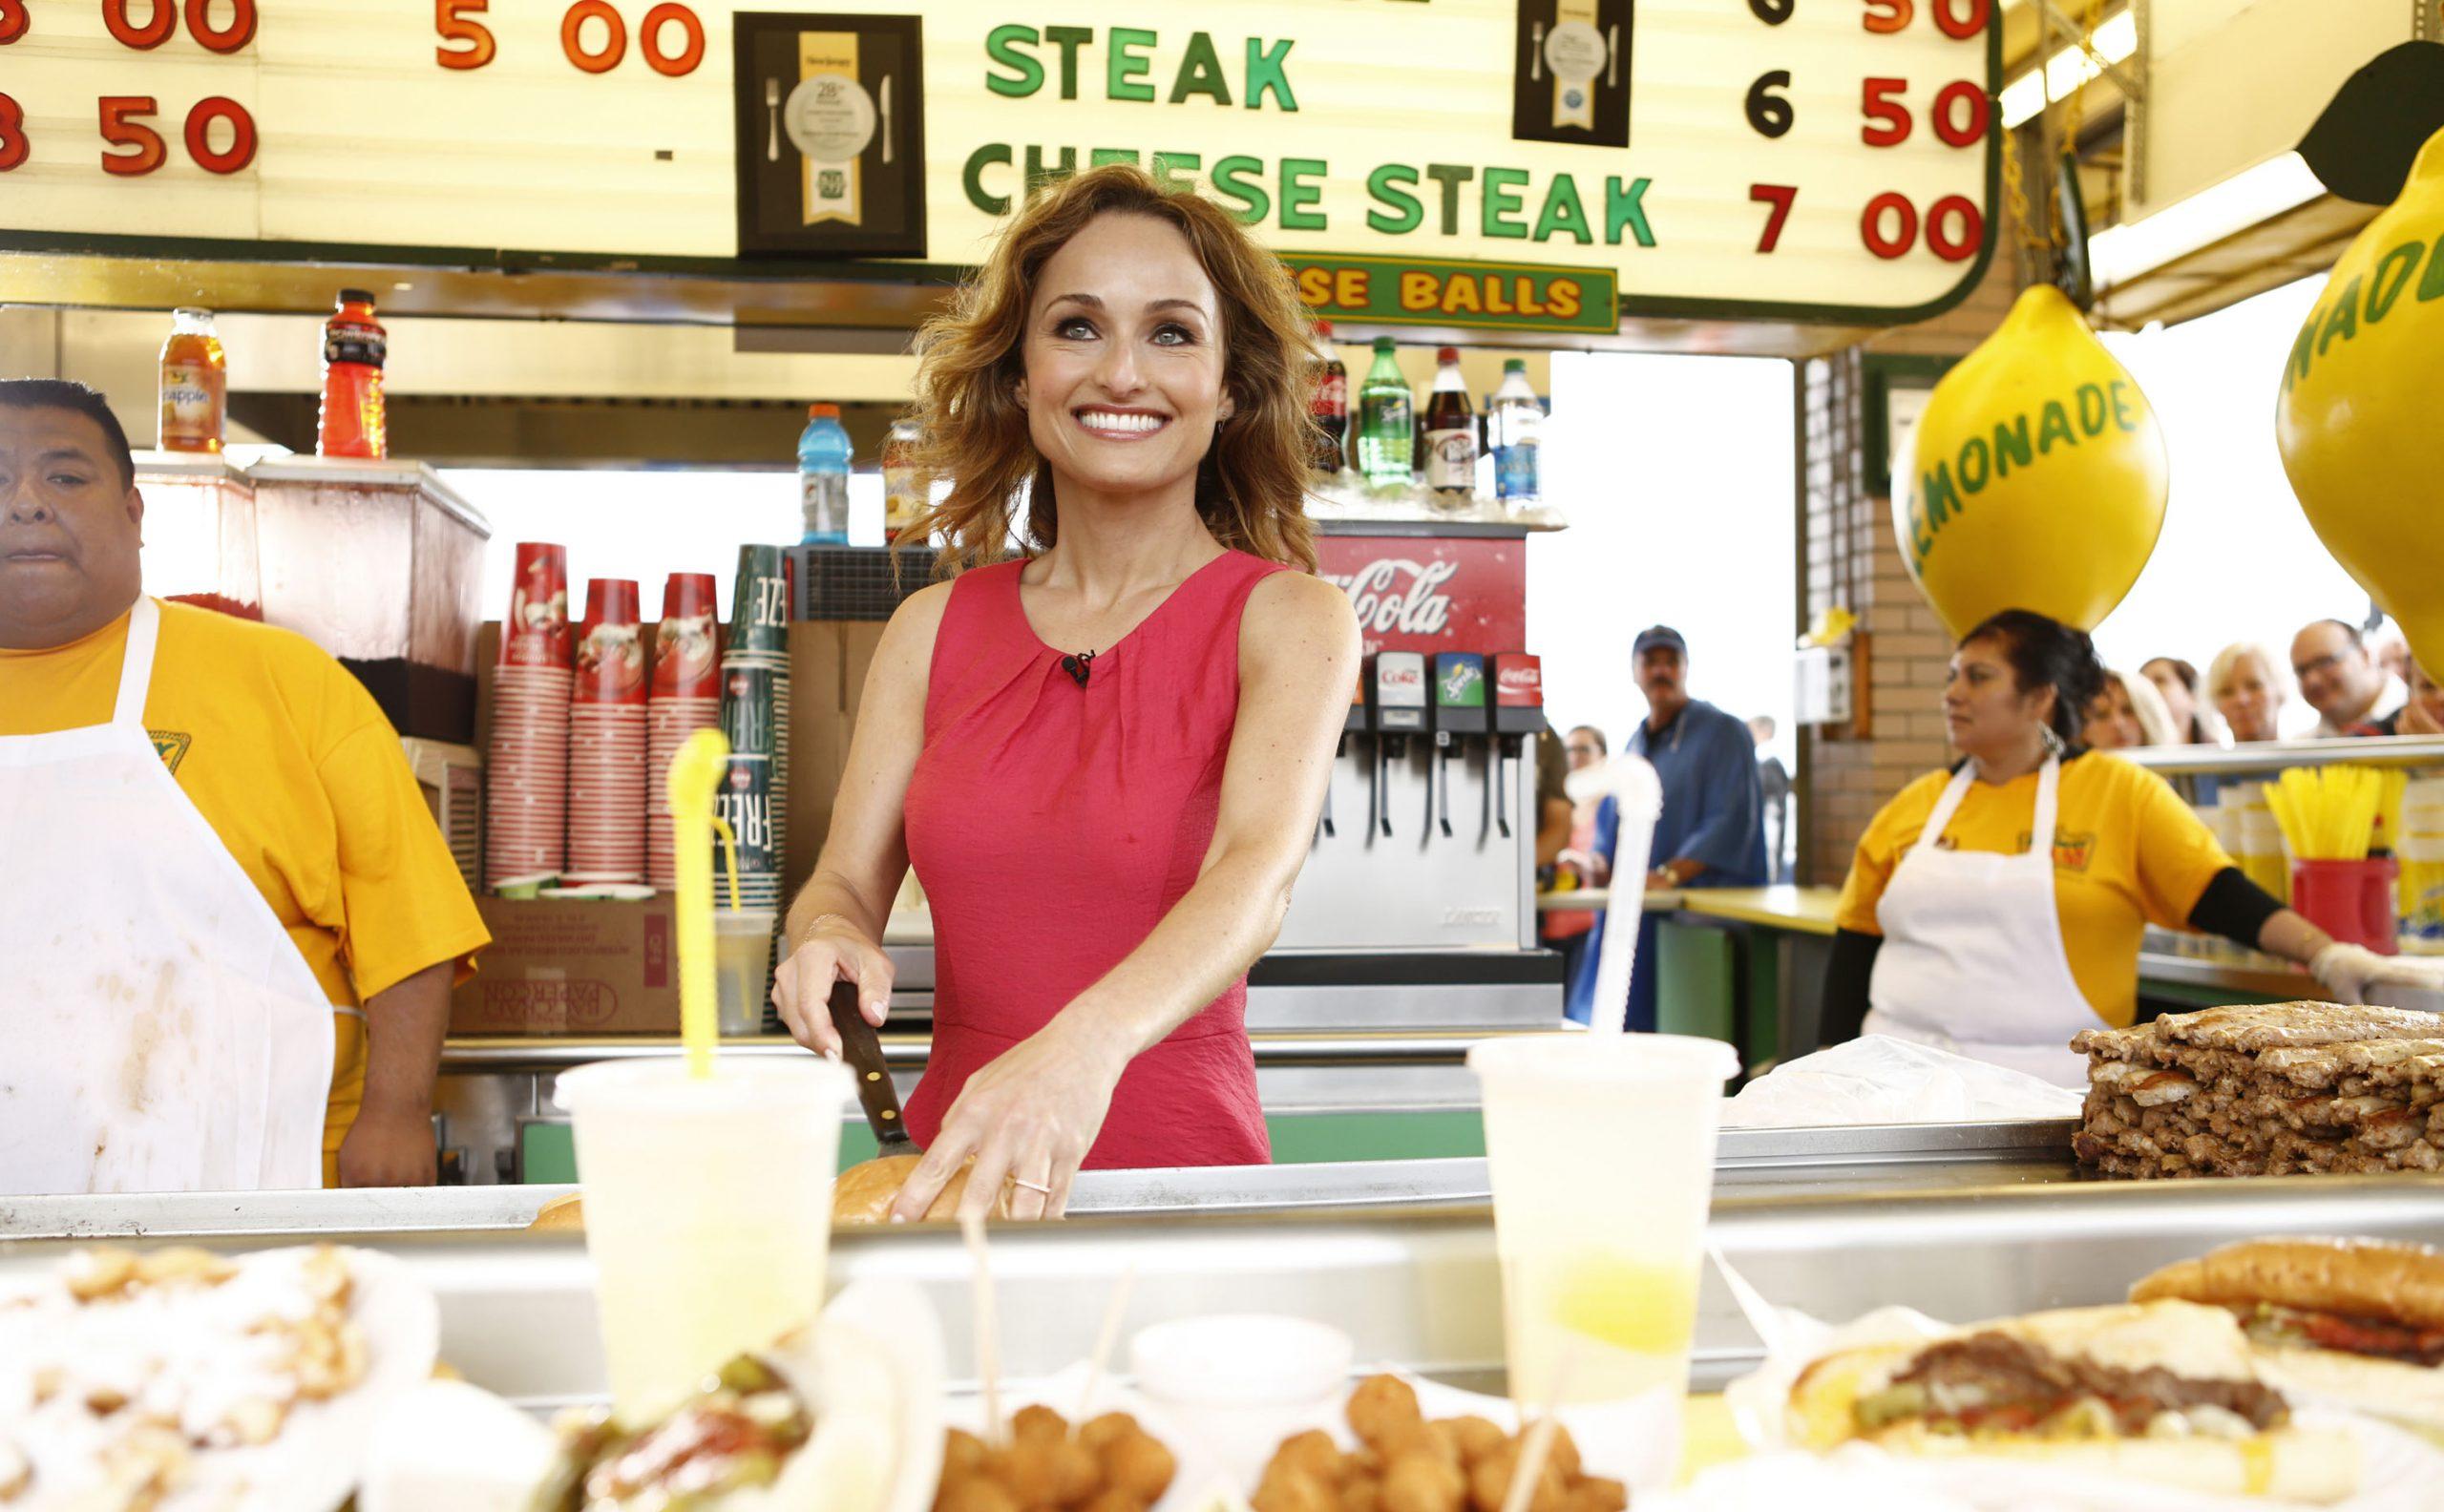 Food Network star Giada De Laurentiis prepares a recipe on morning show 'Today', 2013